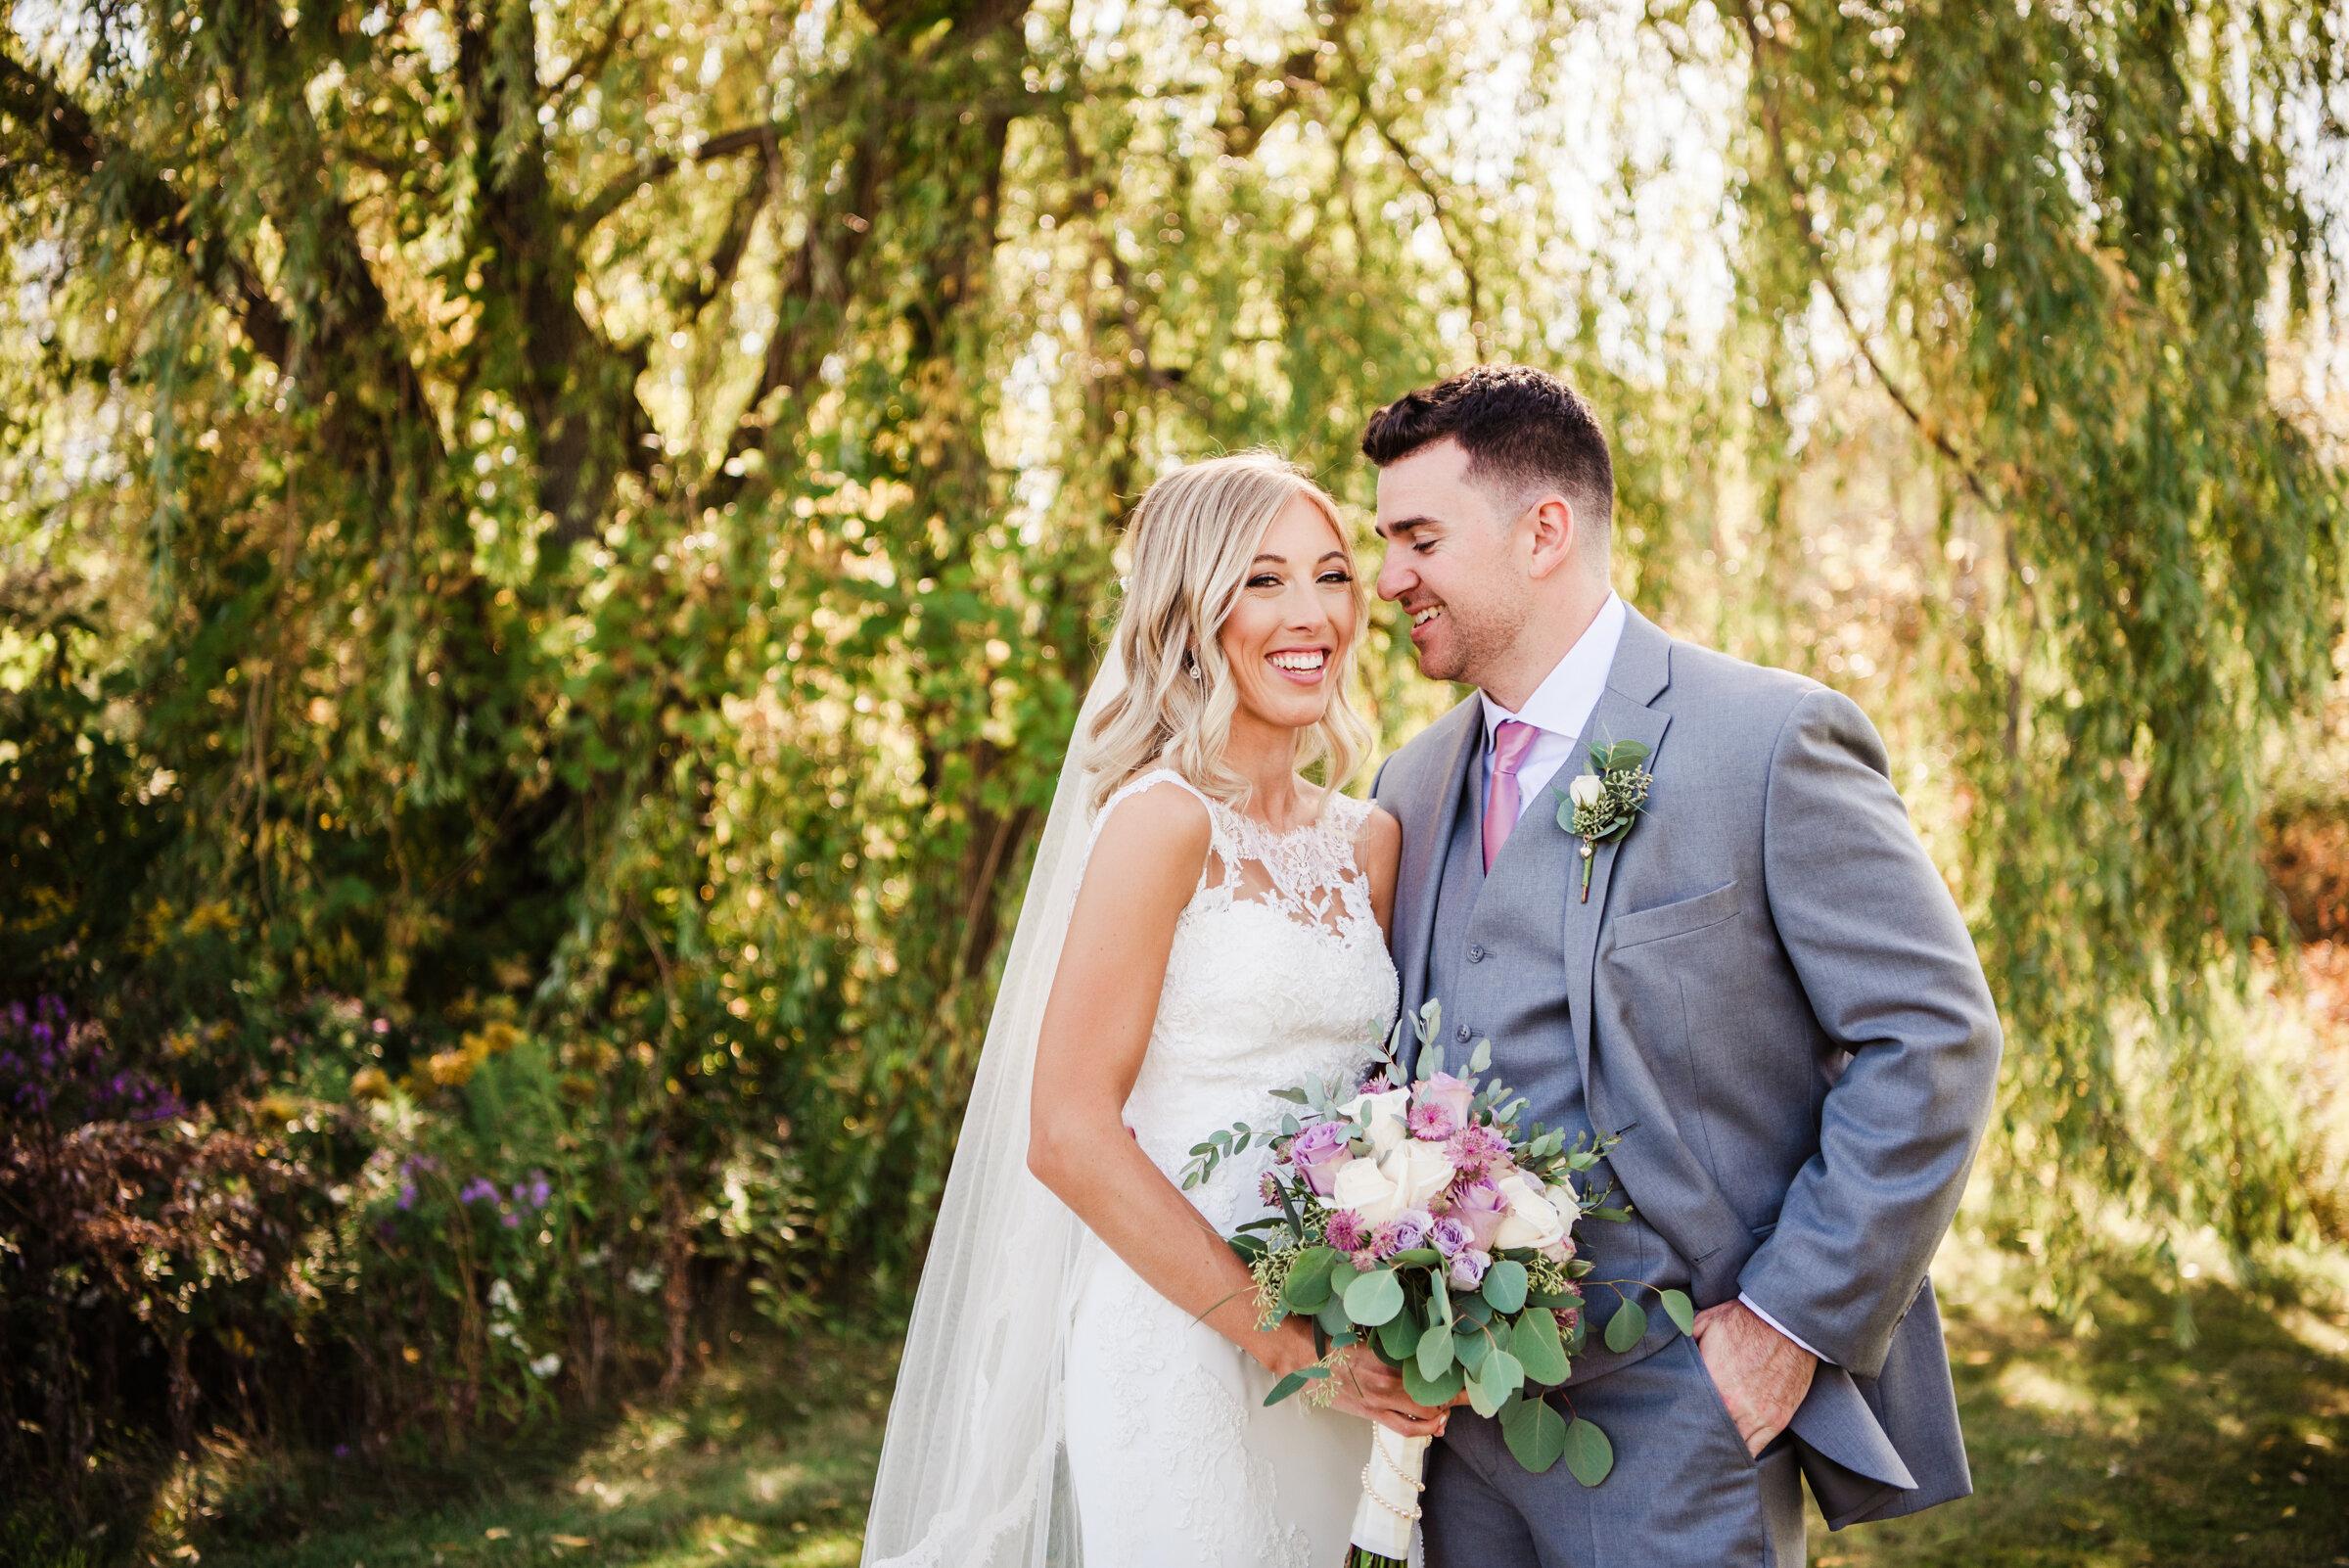 Deerfield_Country_Club_Rochester_Wedding_JILL_STUDIO_Rochester_NY_Photographer_DSC_6375.jpg